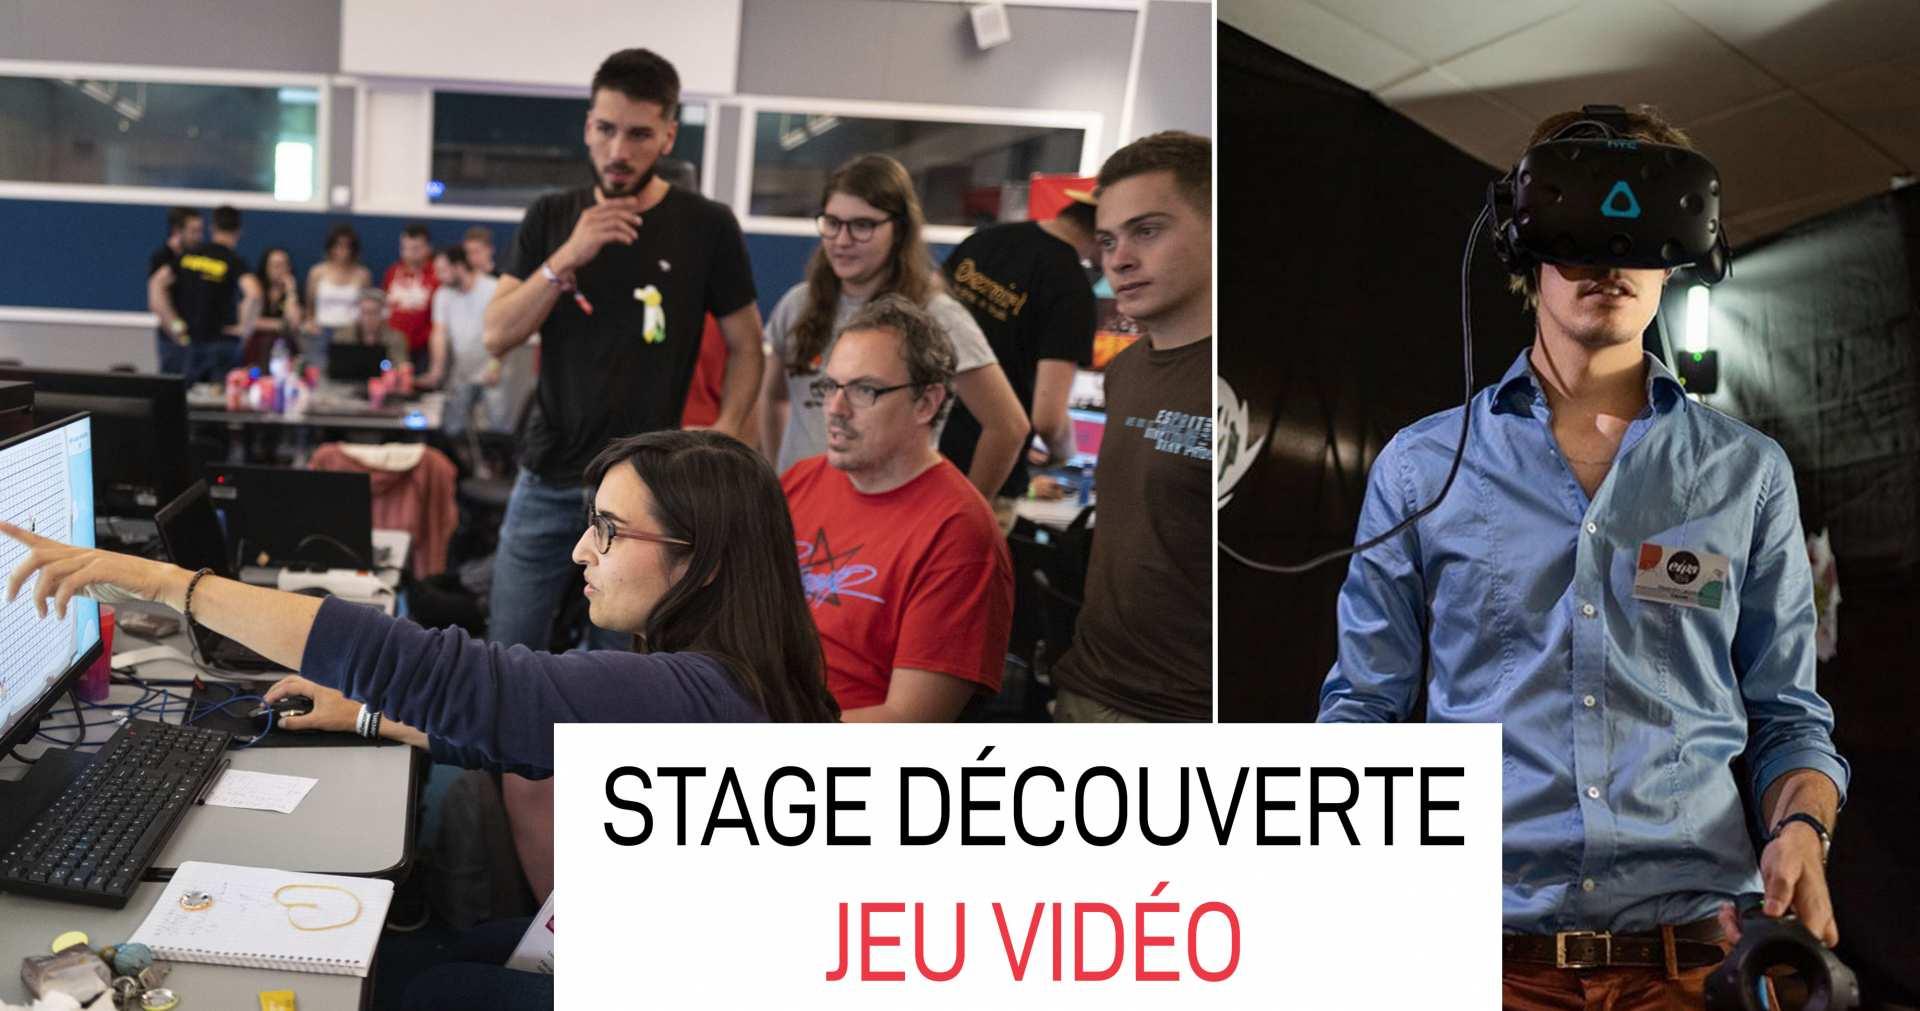 stage-decouverte-jv-vignette-site-web.jpg